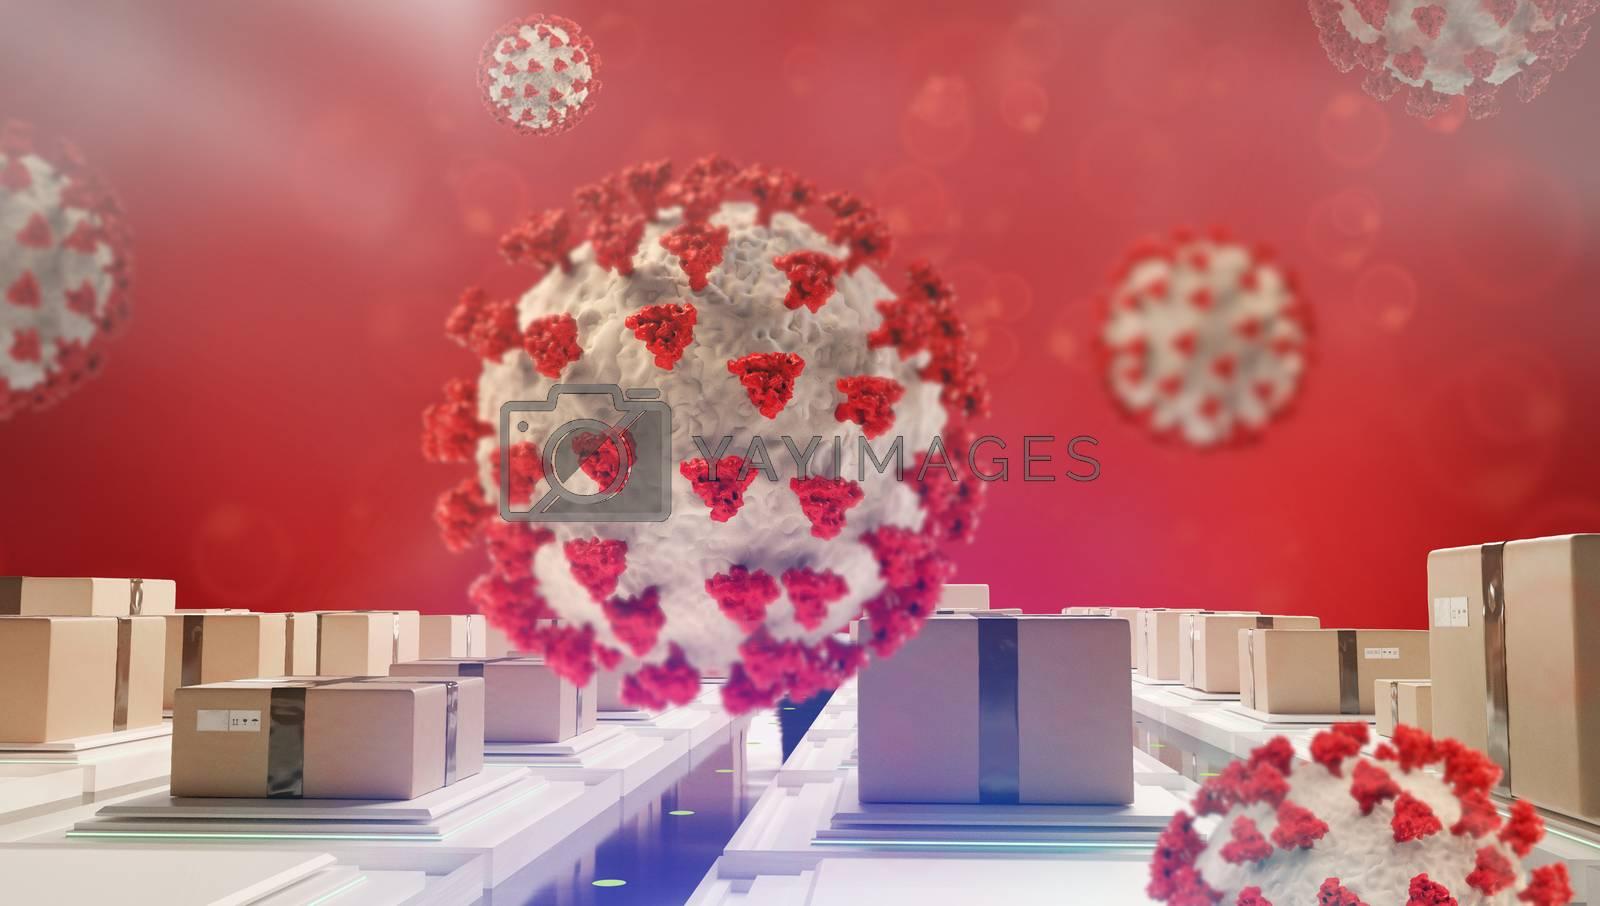 supply concept of SARS-CoV-2 2019-ncov Coronavirus 3d-illustration